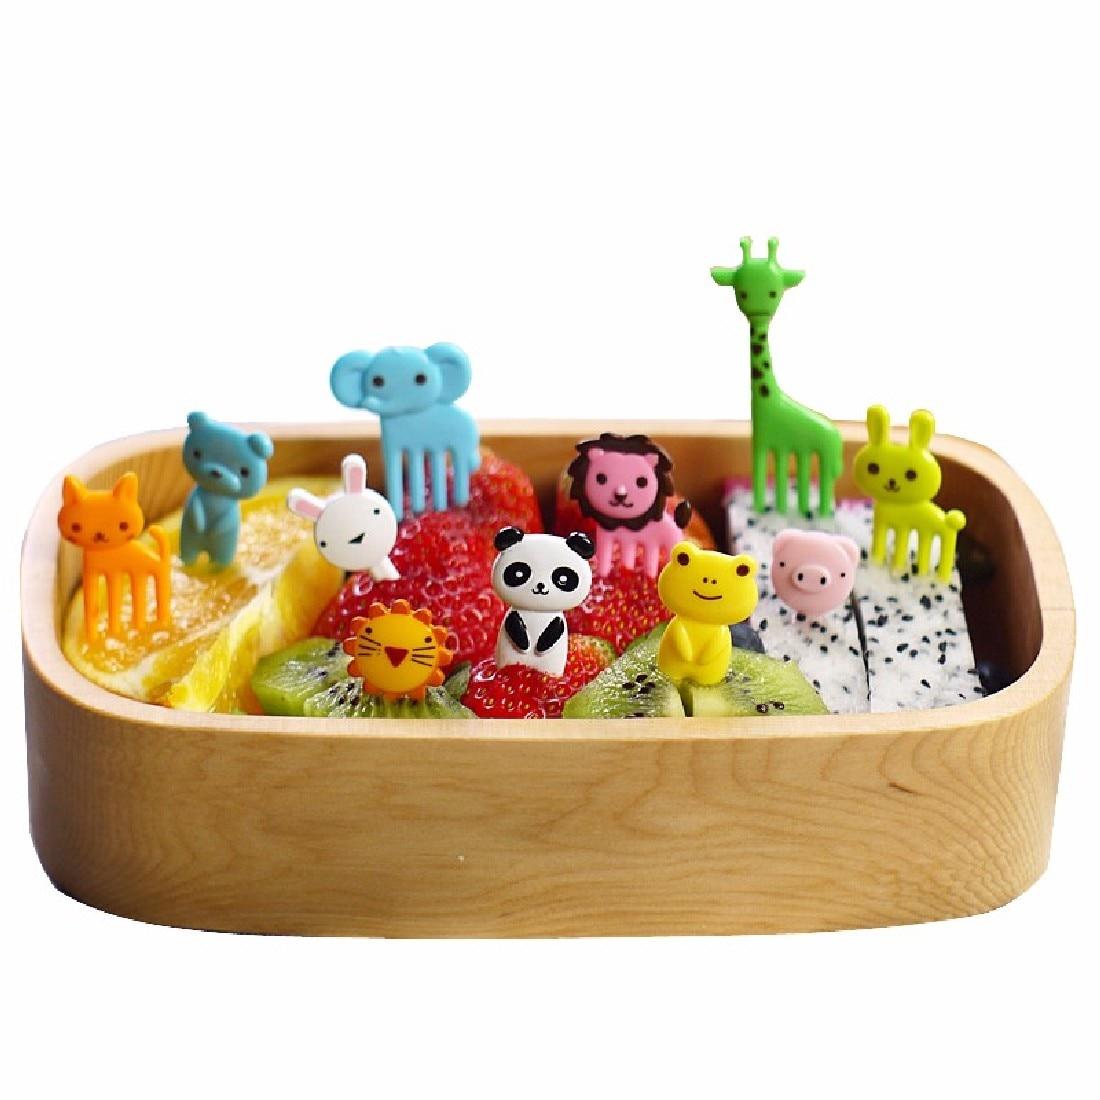 Children Lunch Decorative Color Random 10pcs/set Animal Farm Mini Cartoon Fruit Fork Sign Resin Fruit Toothpick Bento Lunch